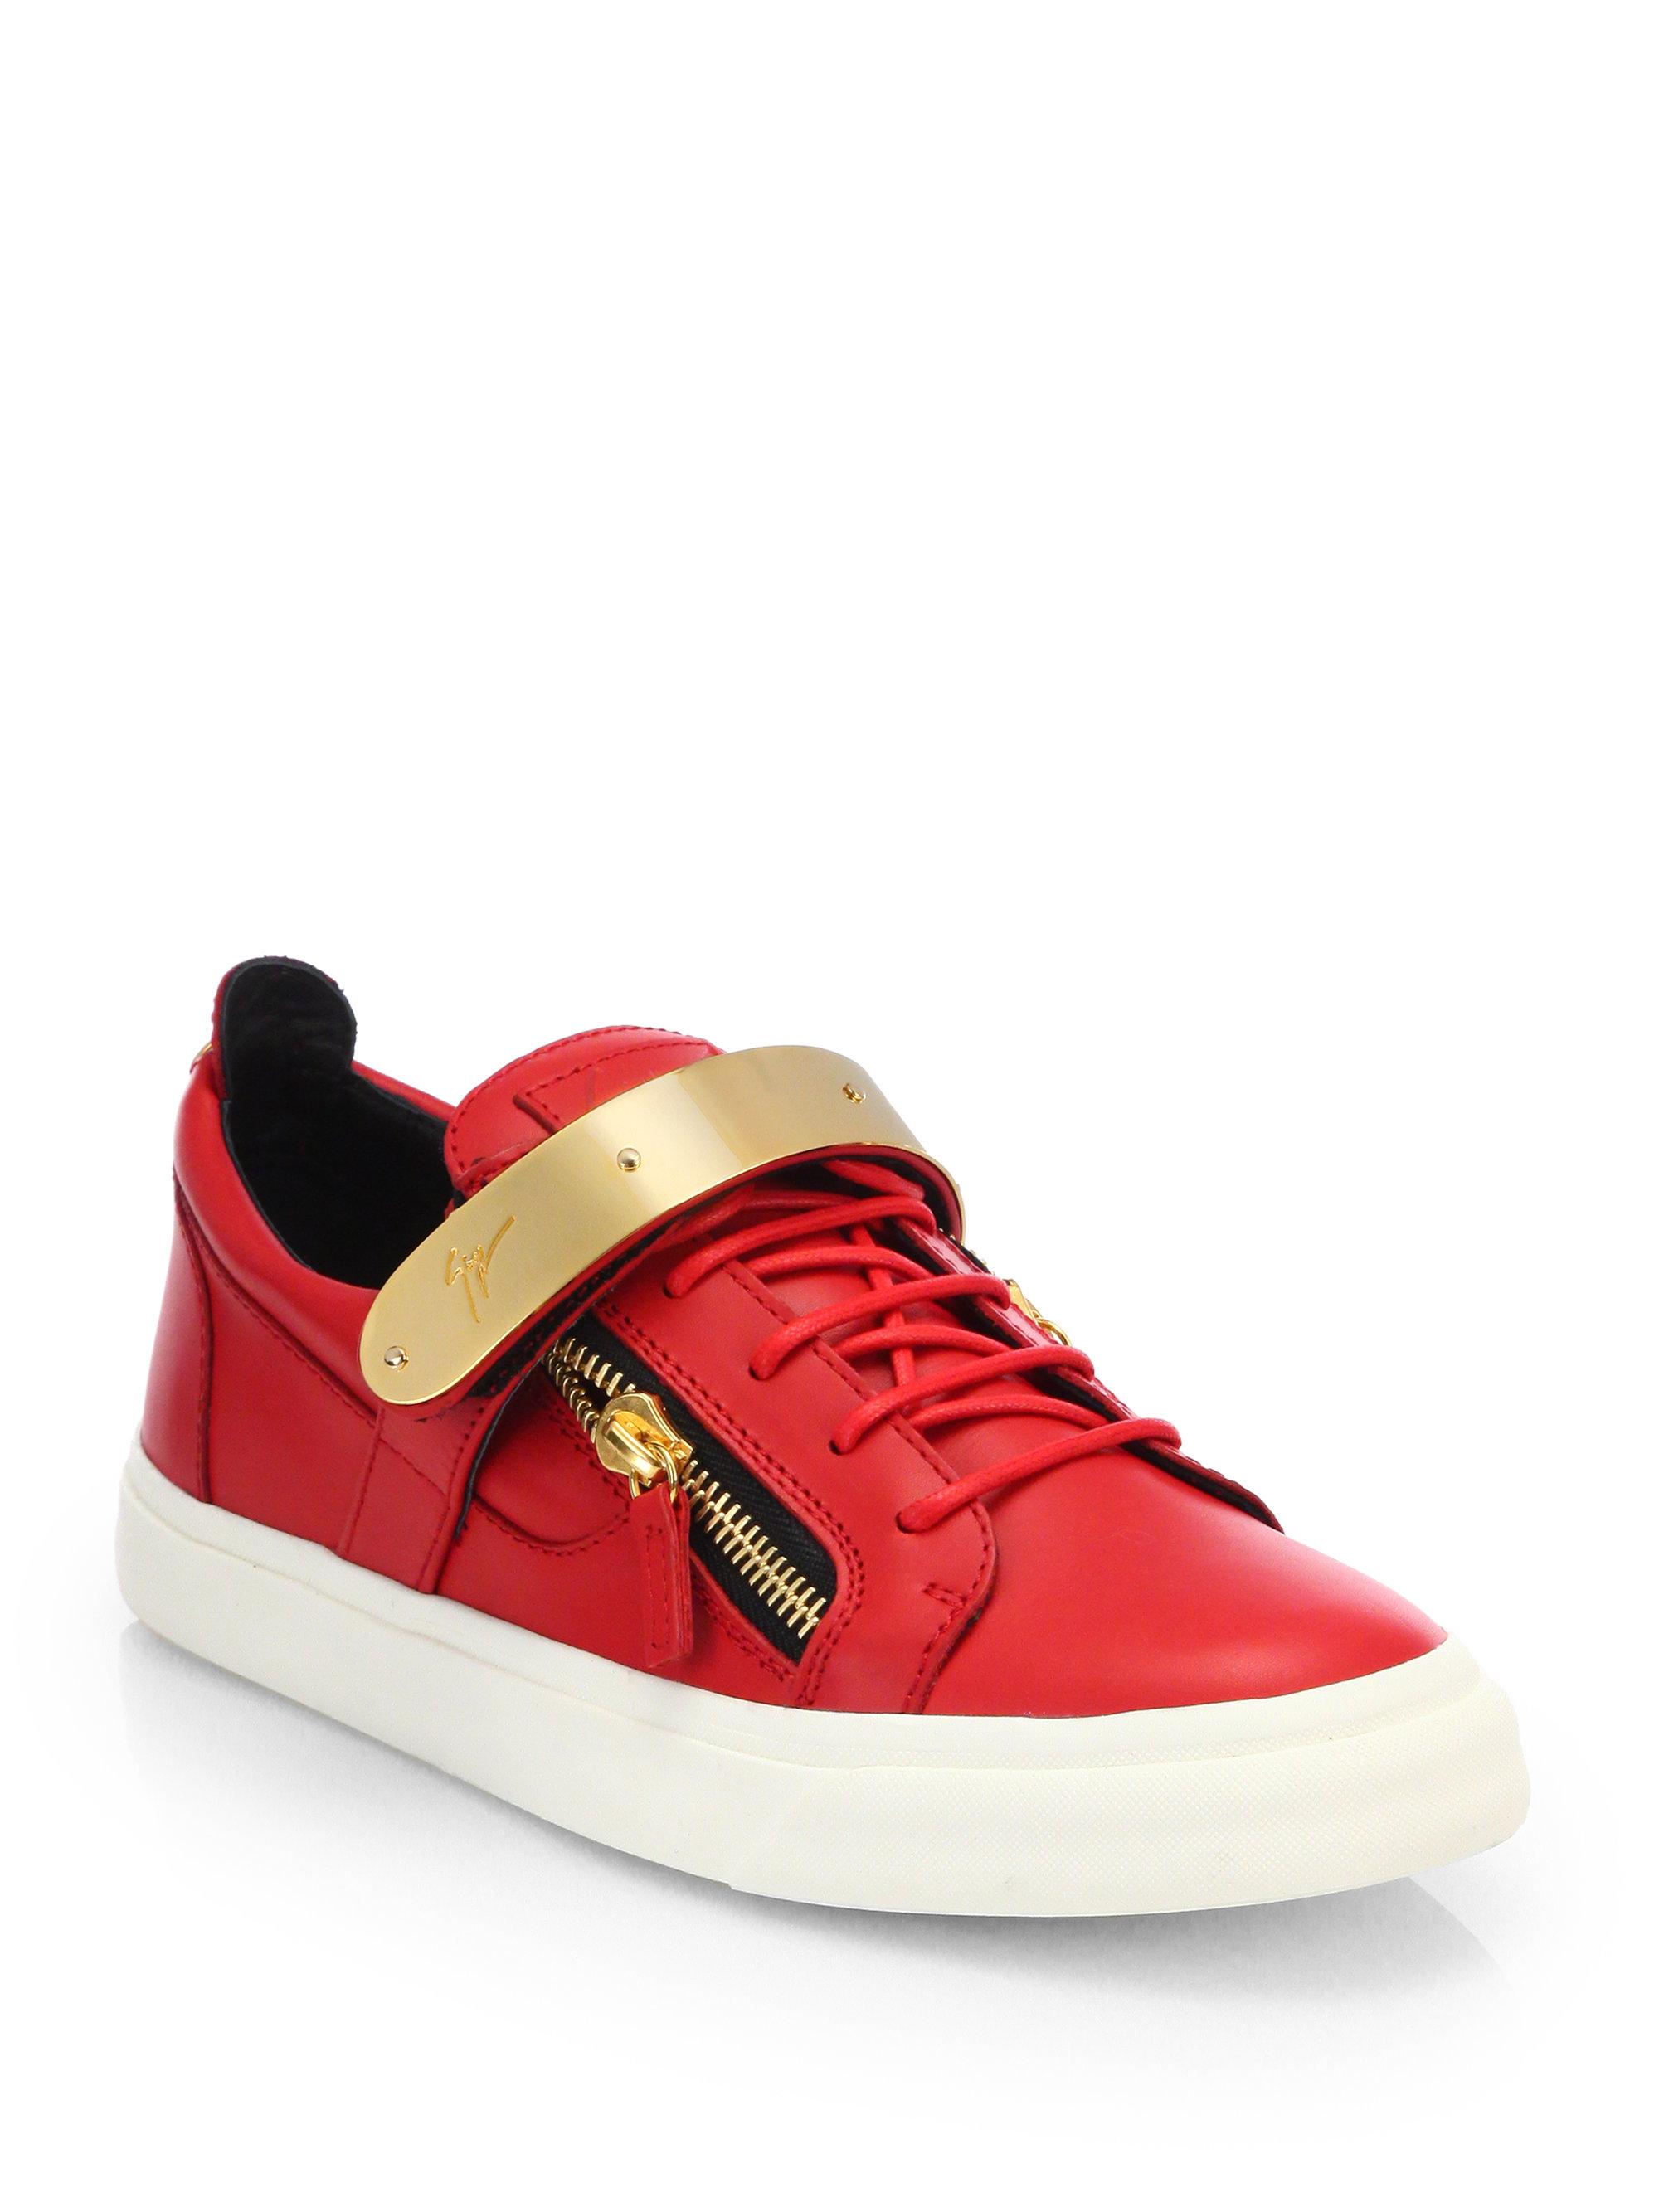 Giuseppe Zanotti Red Shoes